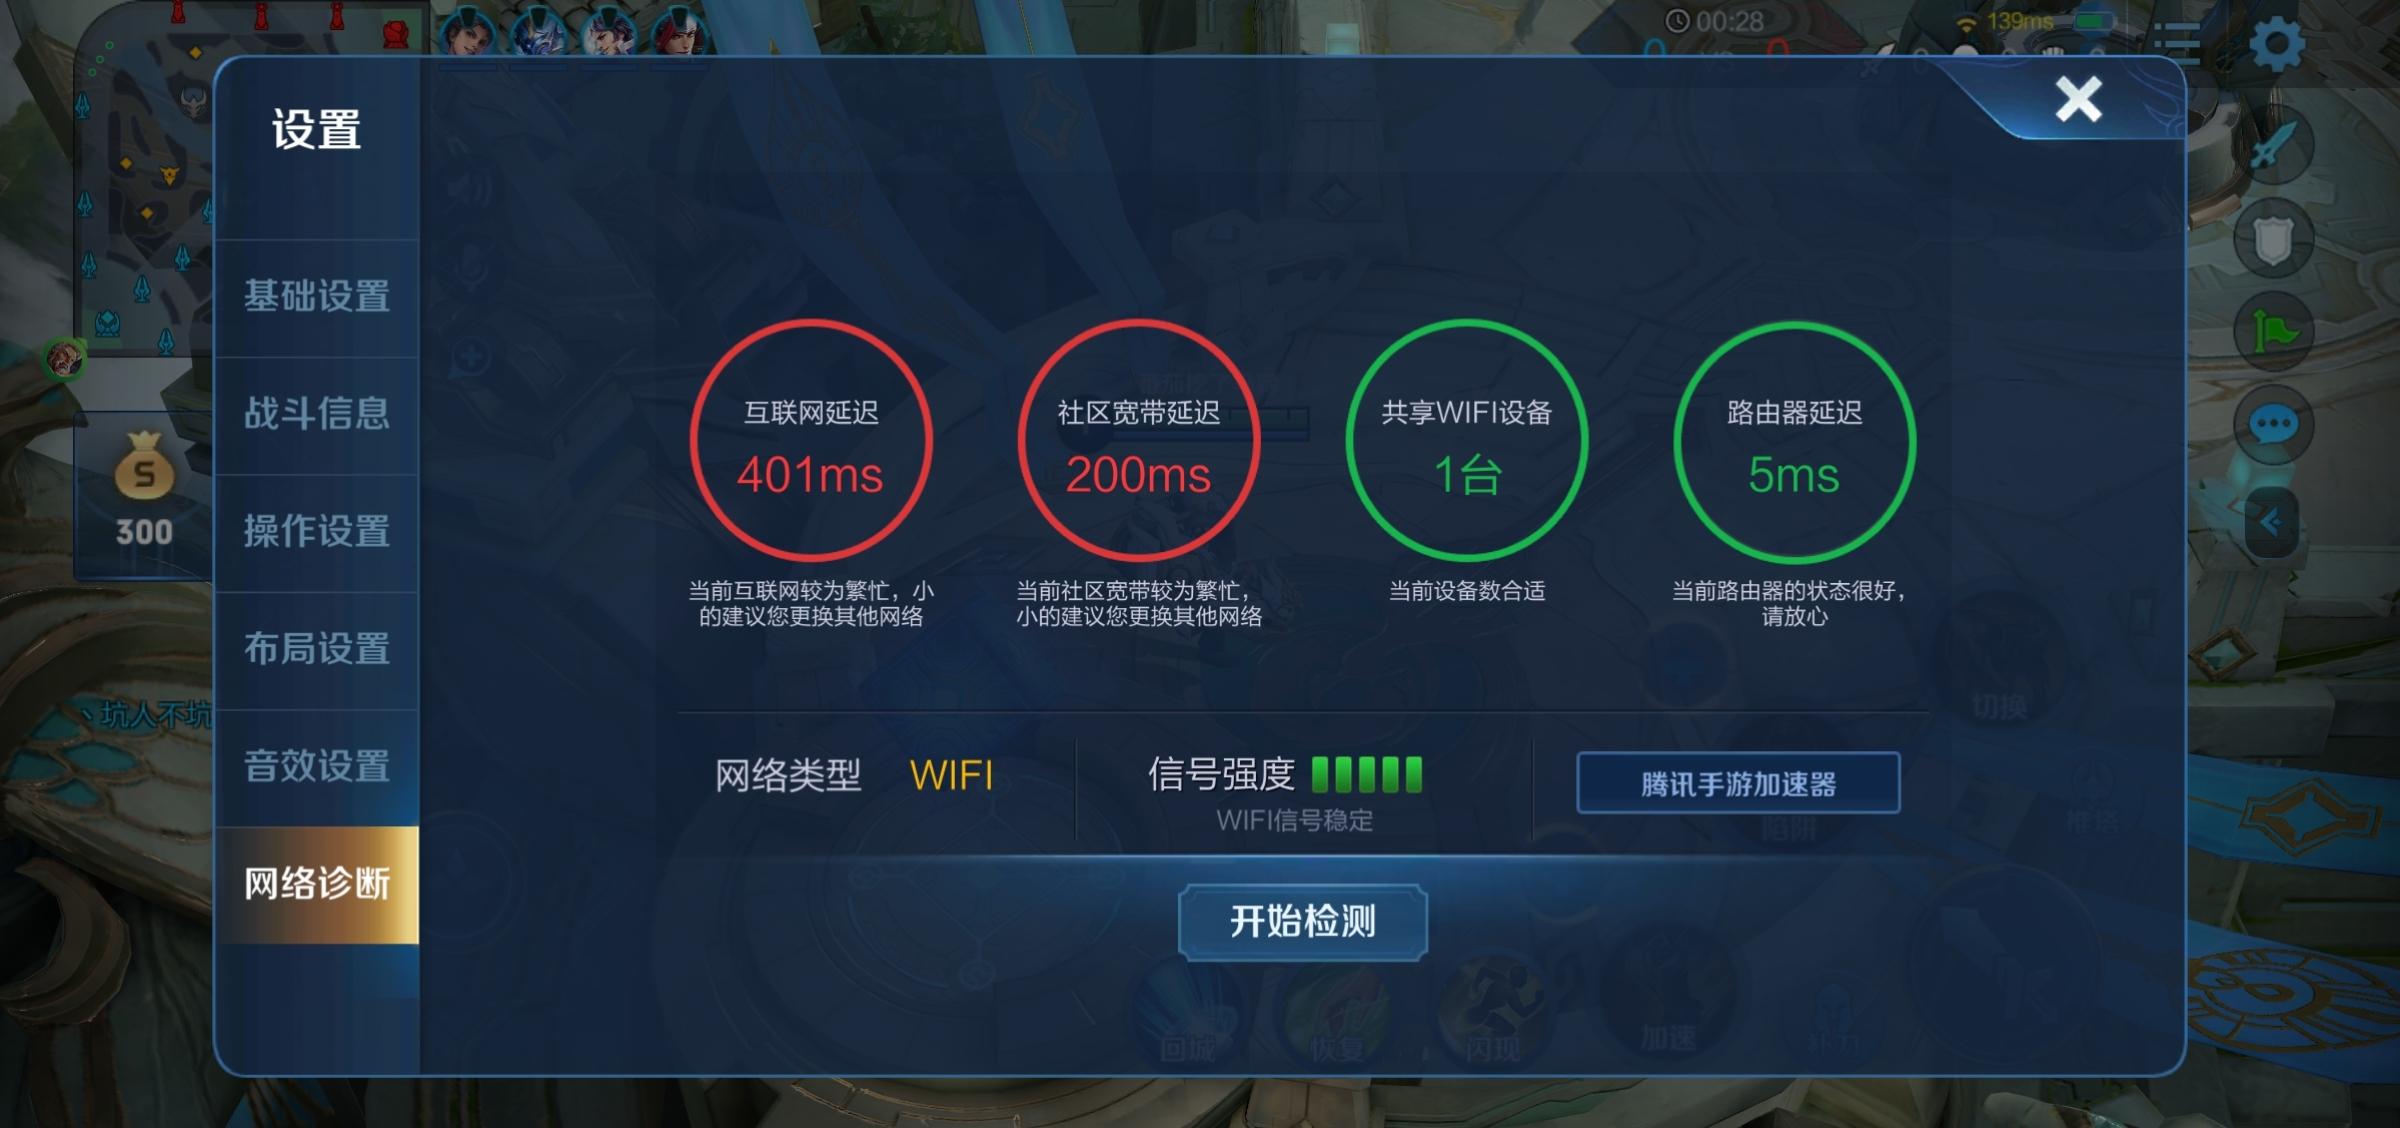 Screenshot_20200516_011834_com.tencent.tmgp.sgame.jpg